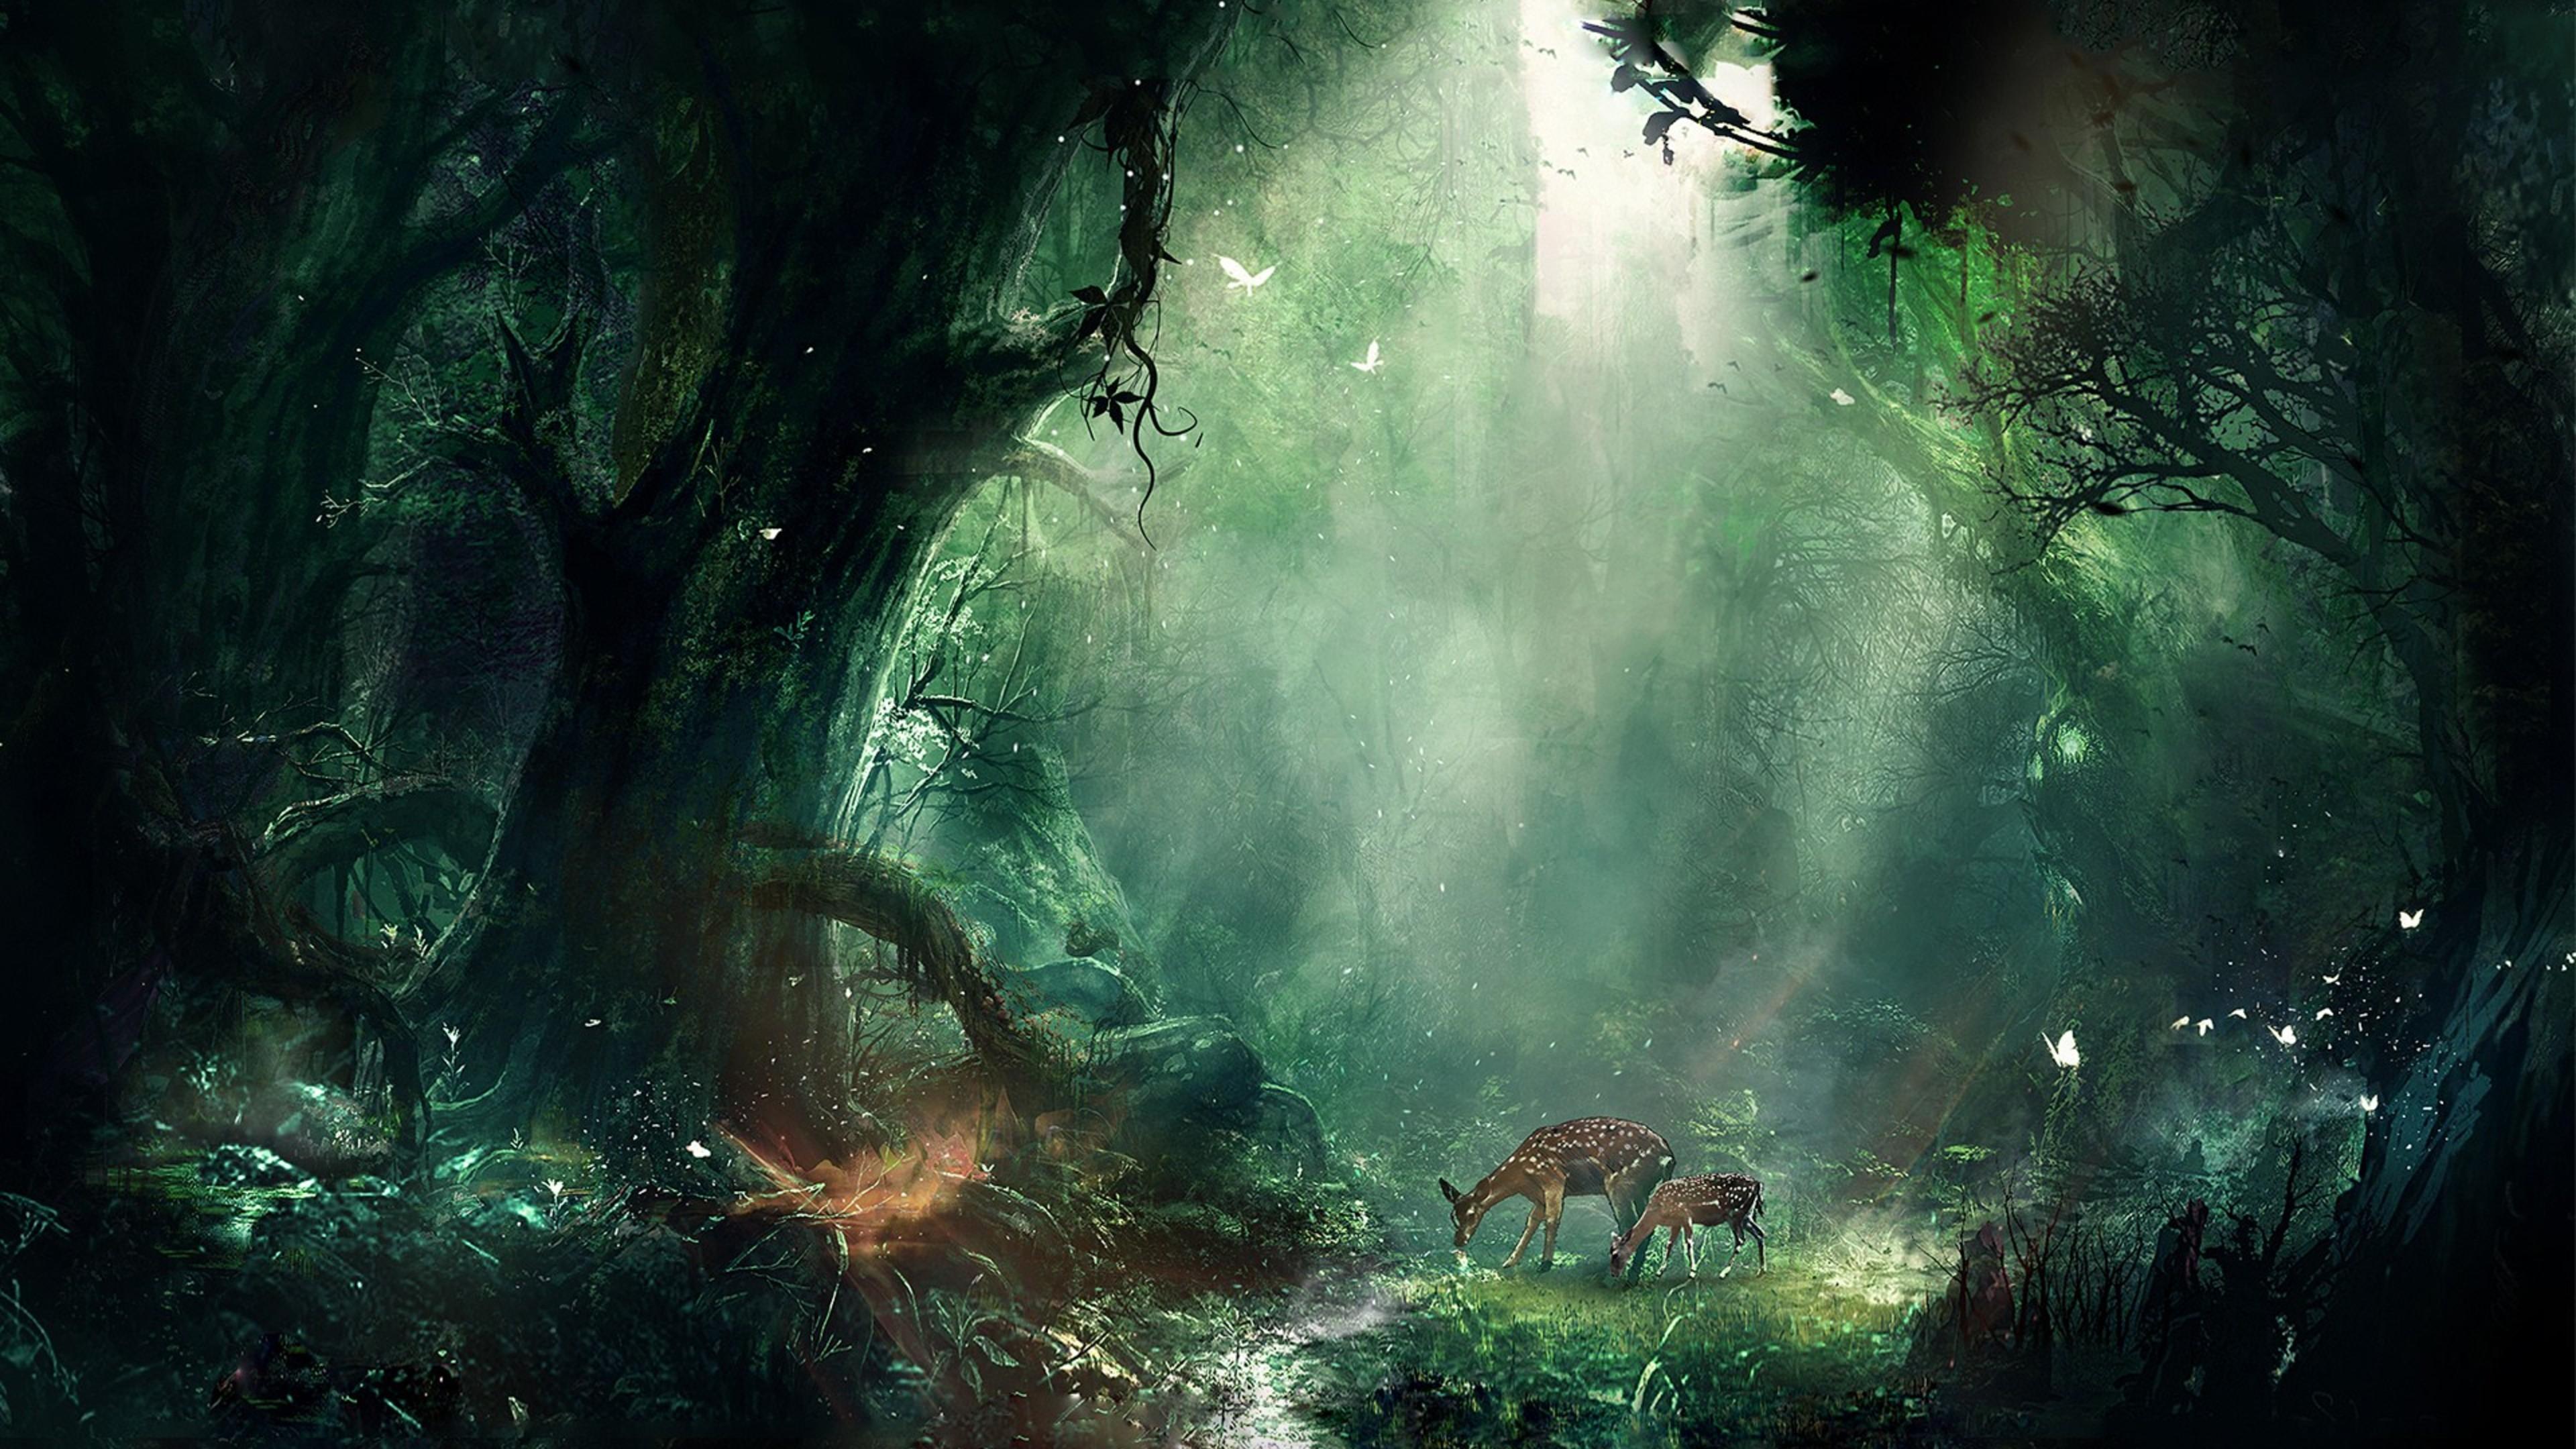 Desktop Wallpapers 3d Graphics Amazon Forest 1080x1920 Bambi Jungle Iphone 7 6s 6 Plus Pixel Xl One